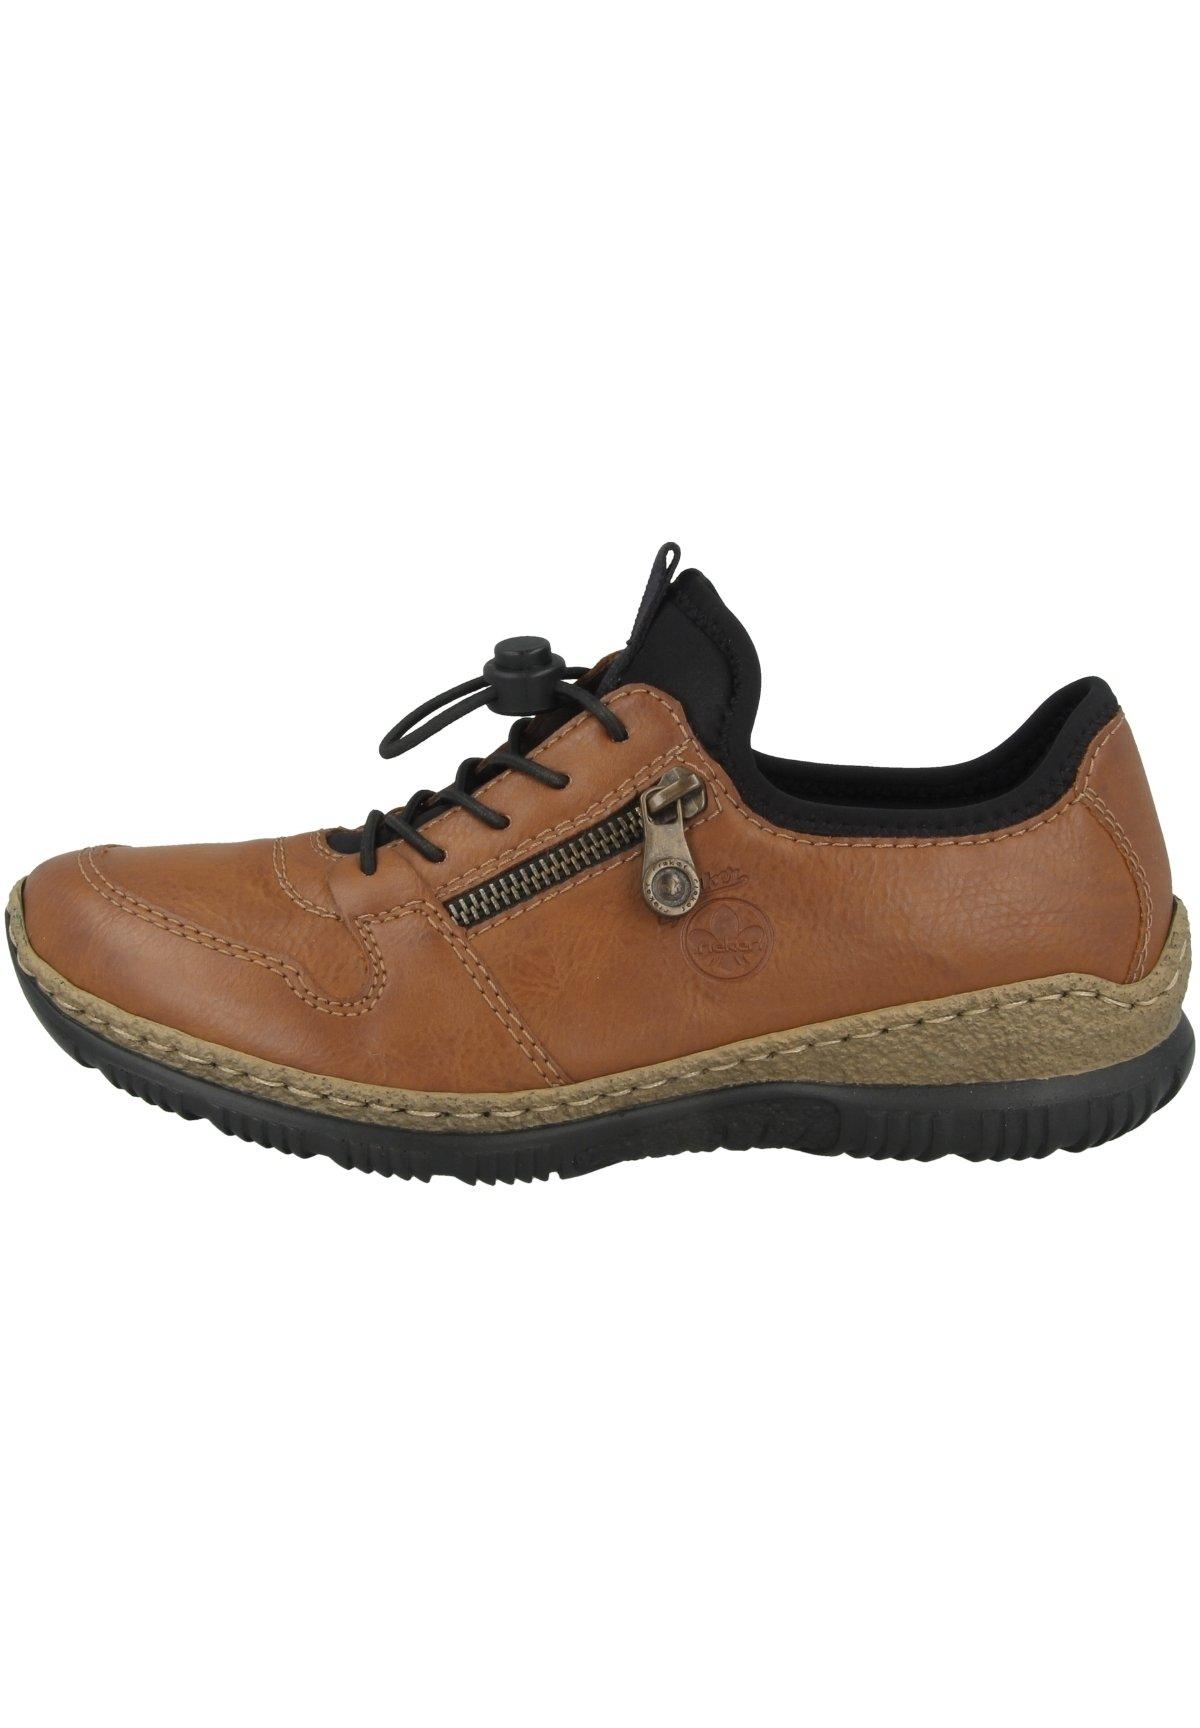 Damer Sneakers - cayenne/black